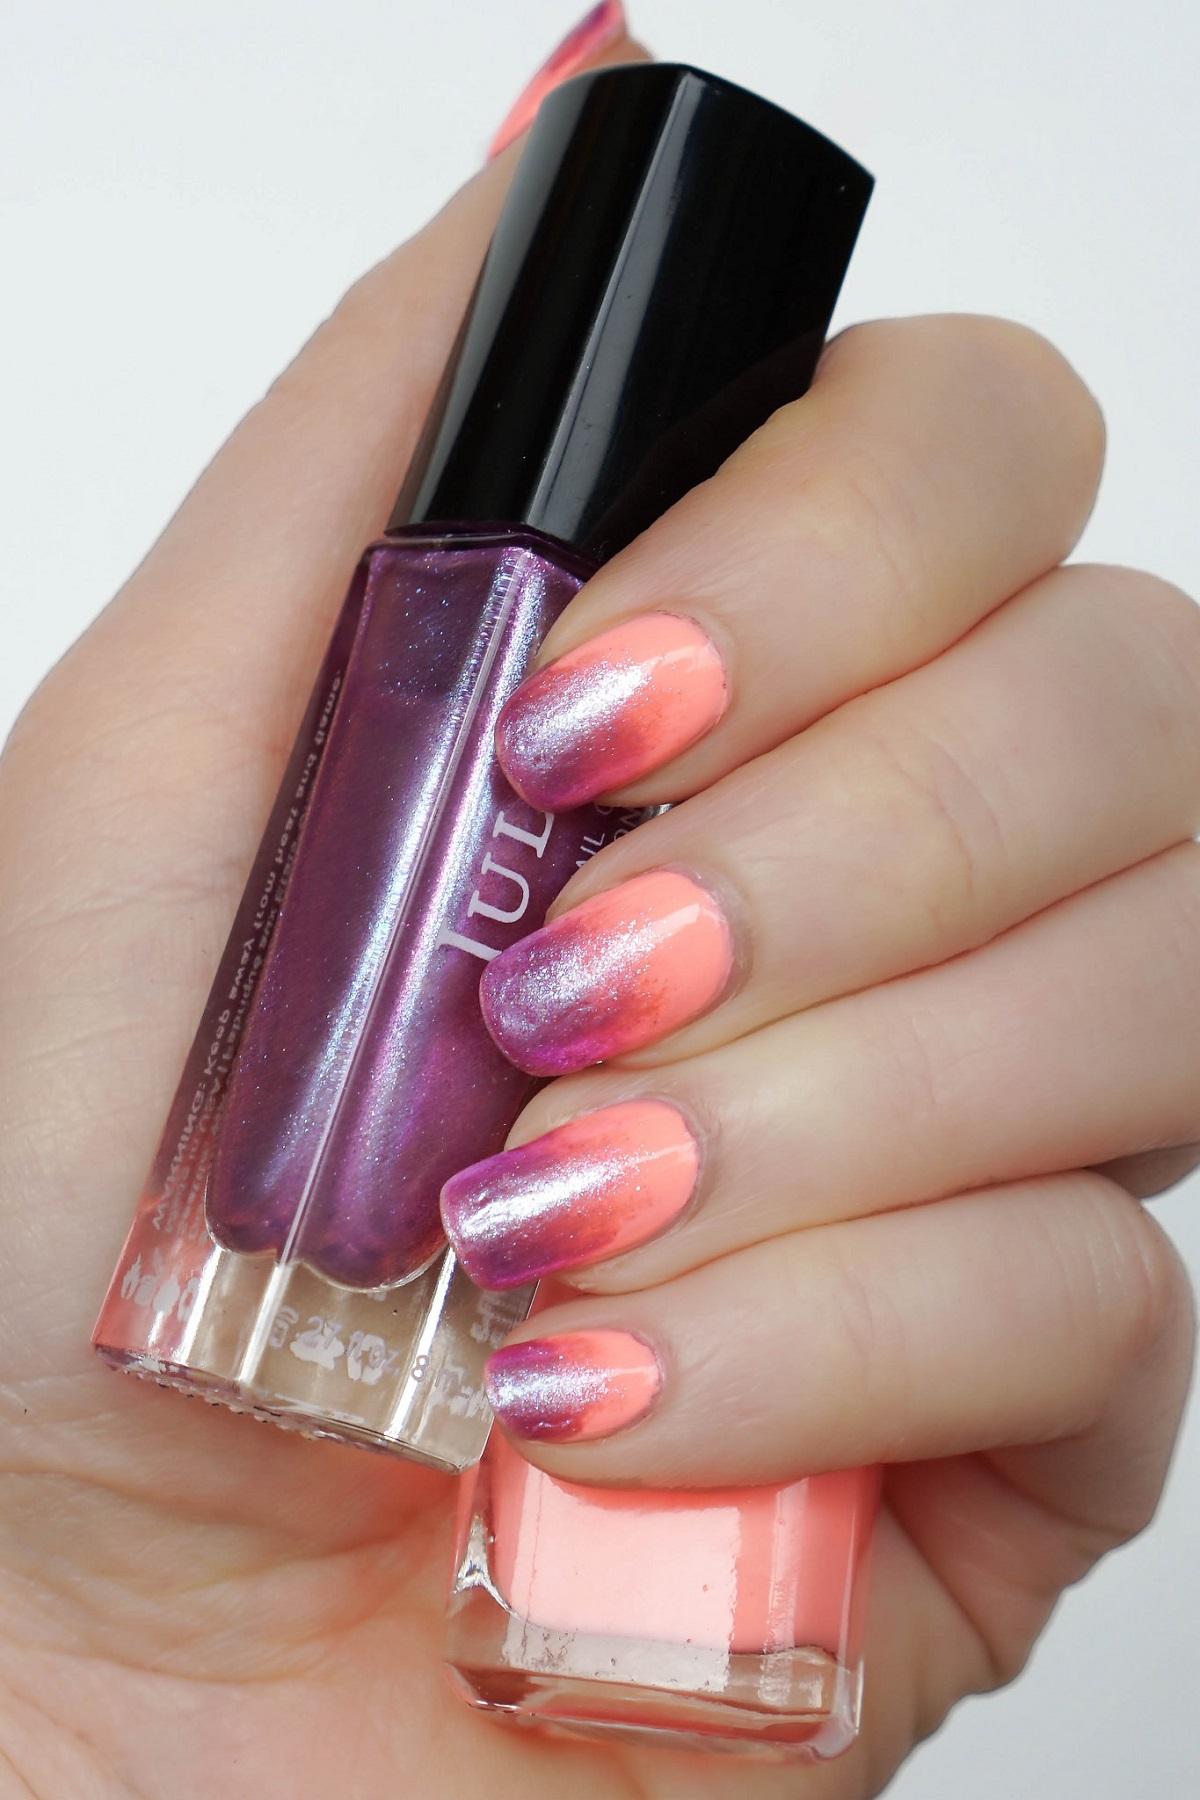 Creamsicle Orange and Iridescent Purple Gradient Manicure